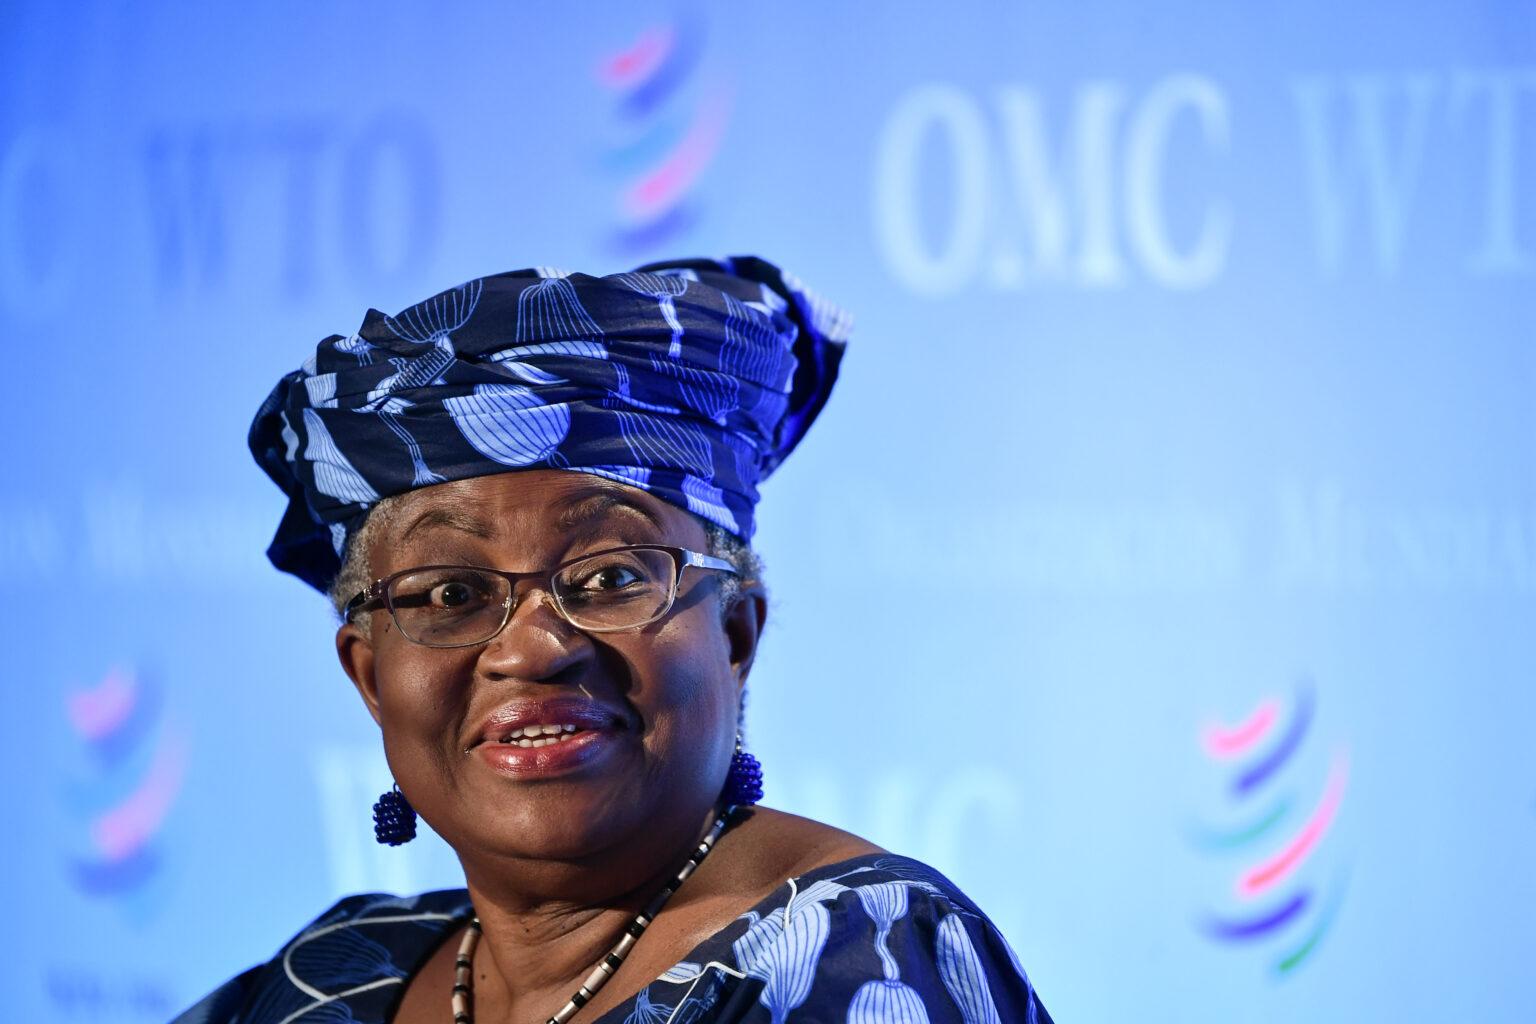 Ngozi Okonjo-Iweala, Director-General of the World Trade Organization (WTO)